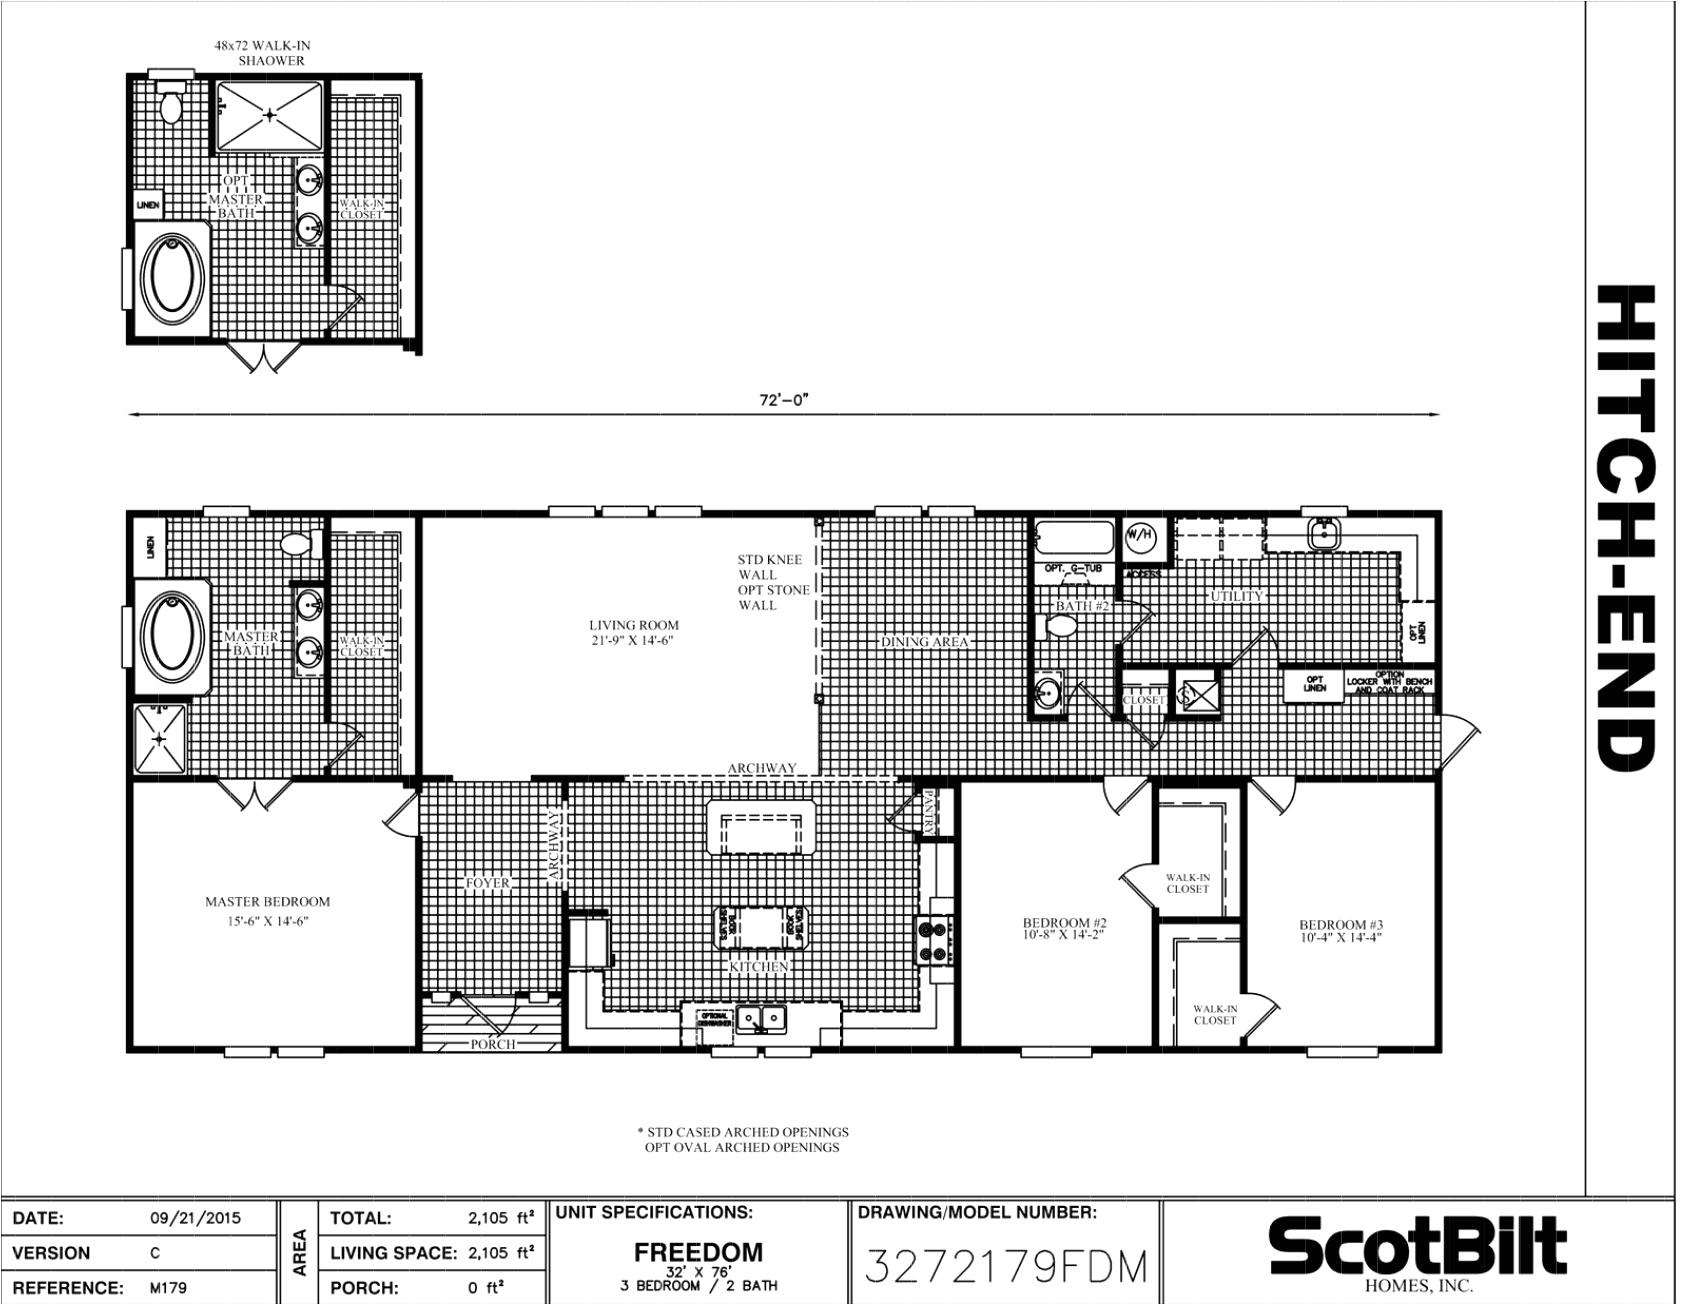 scotbilt homes freedom